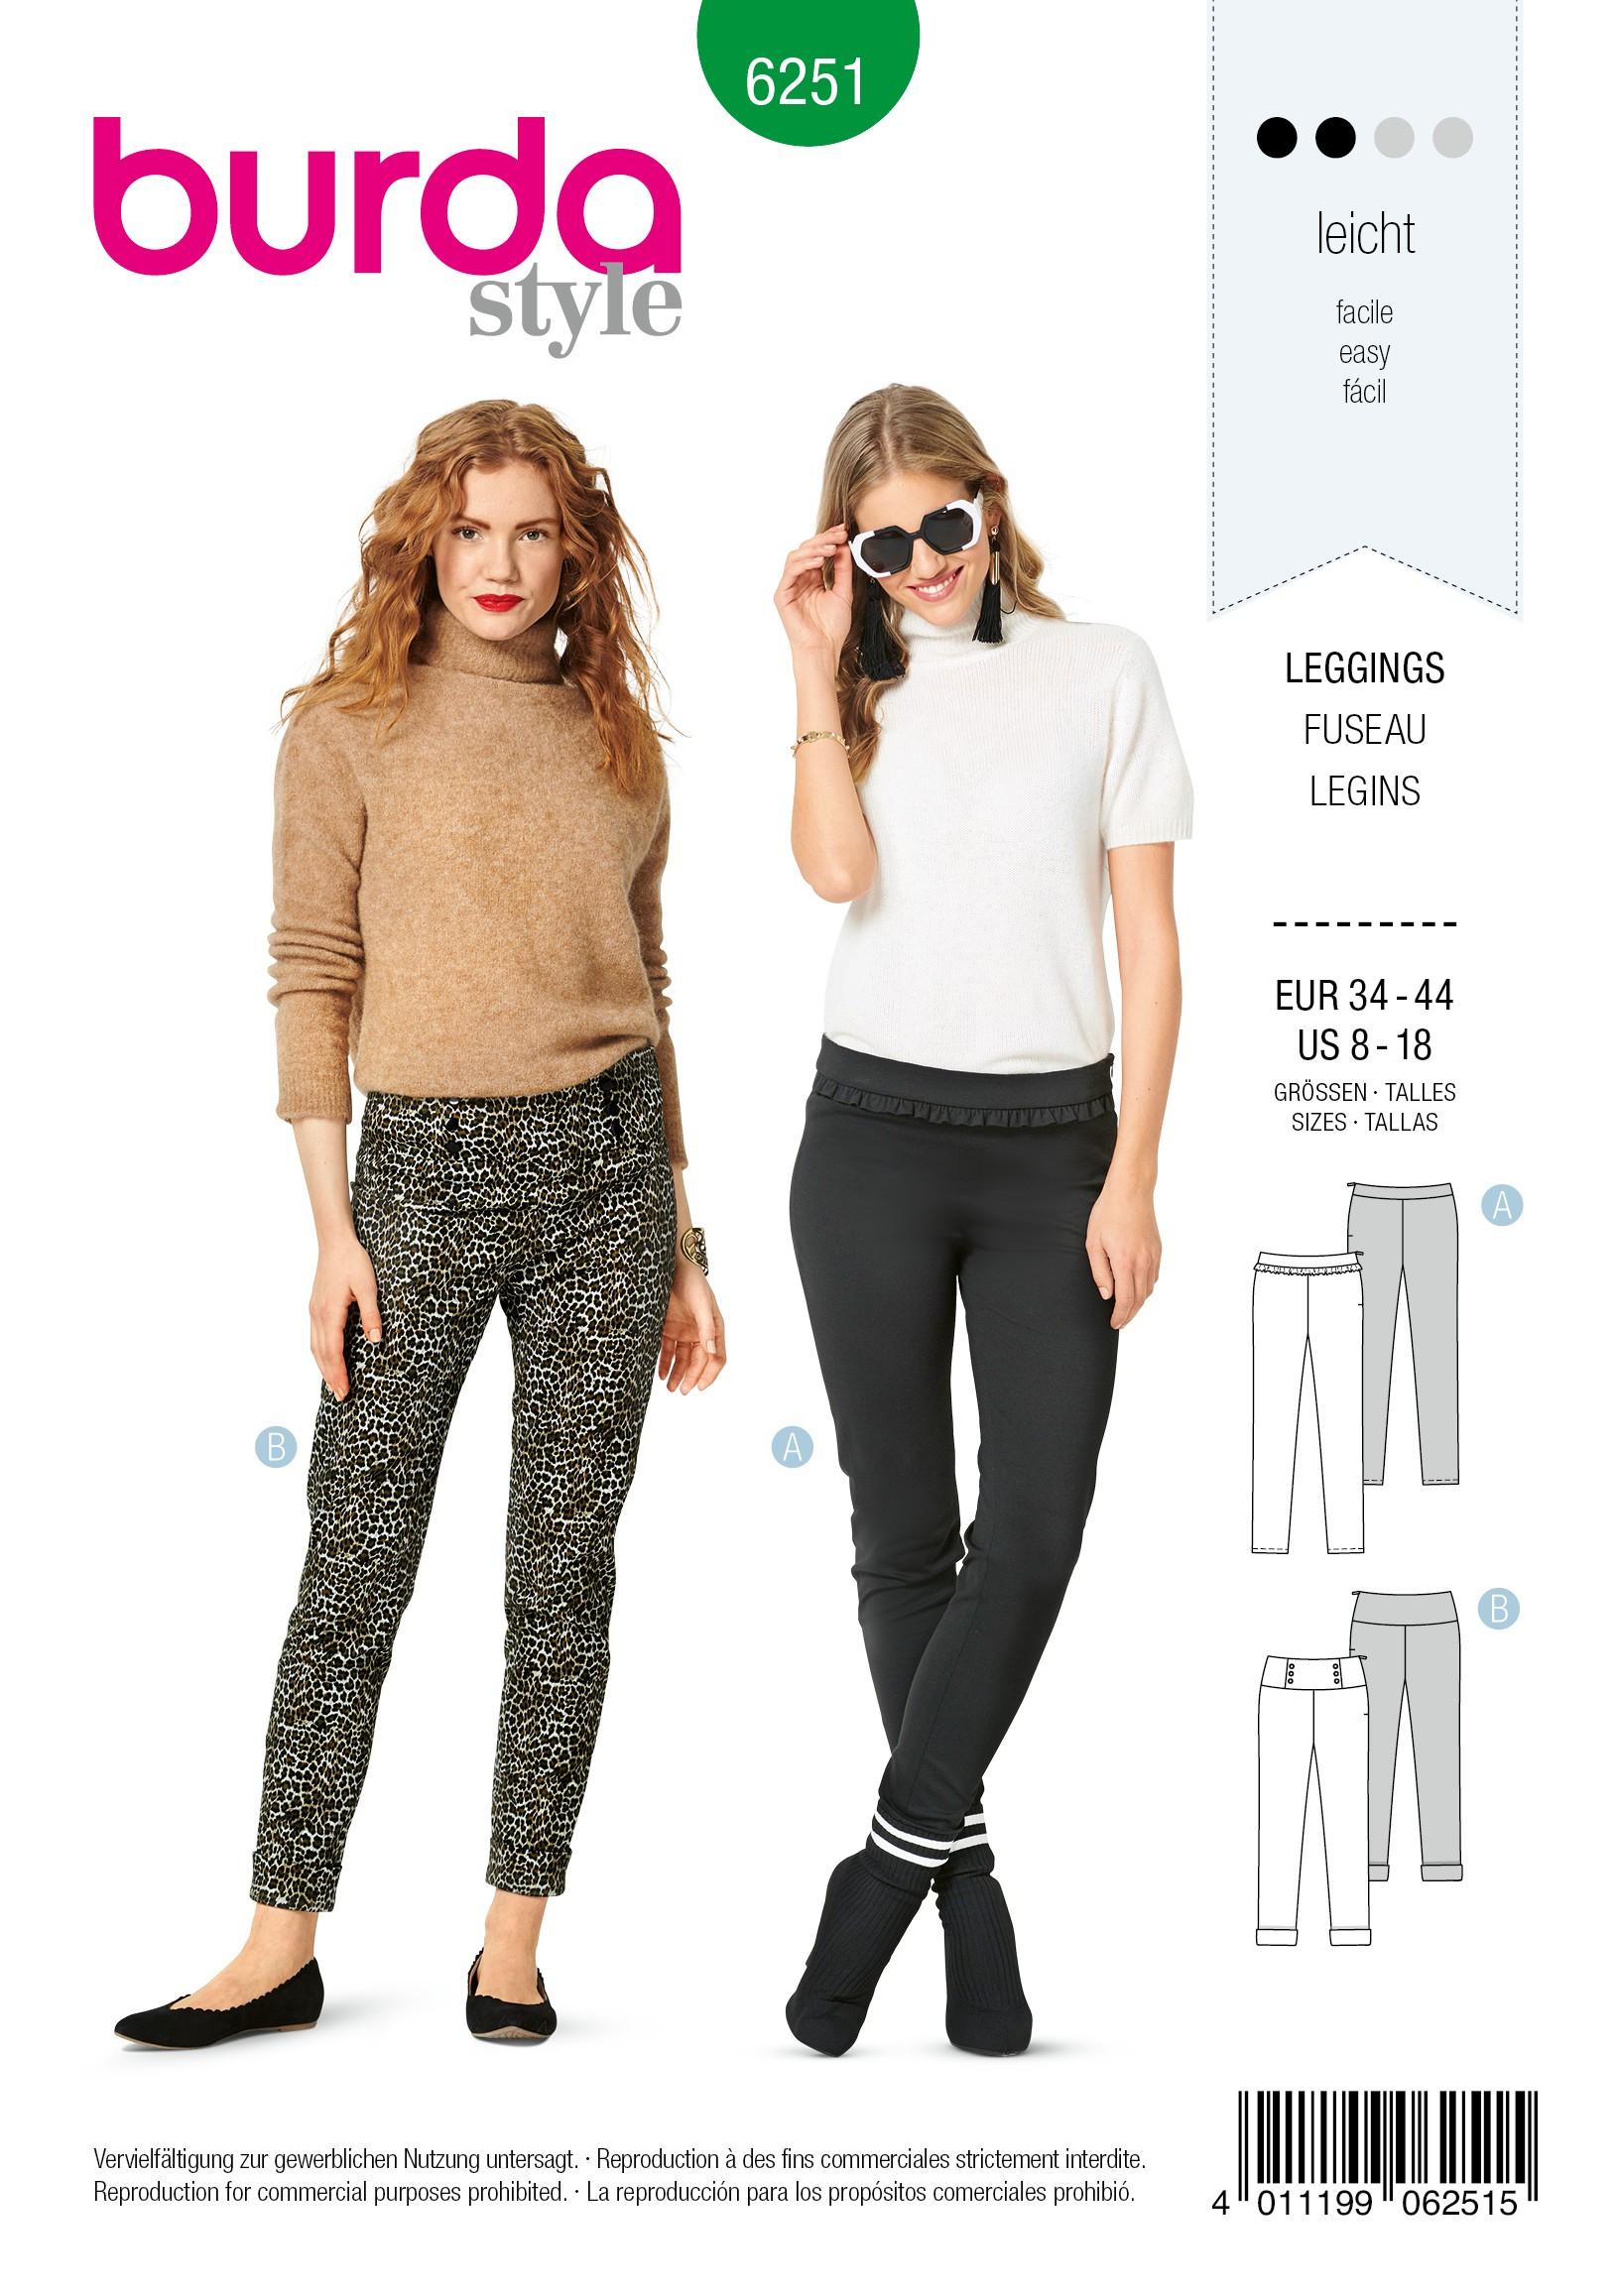 Burda Style Sewing Pattern 6251 Women's Skinny Stretch Trousers Leggings